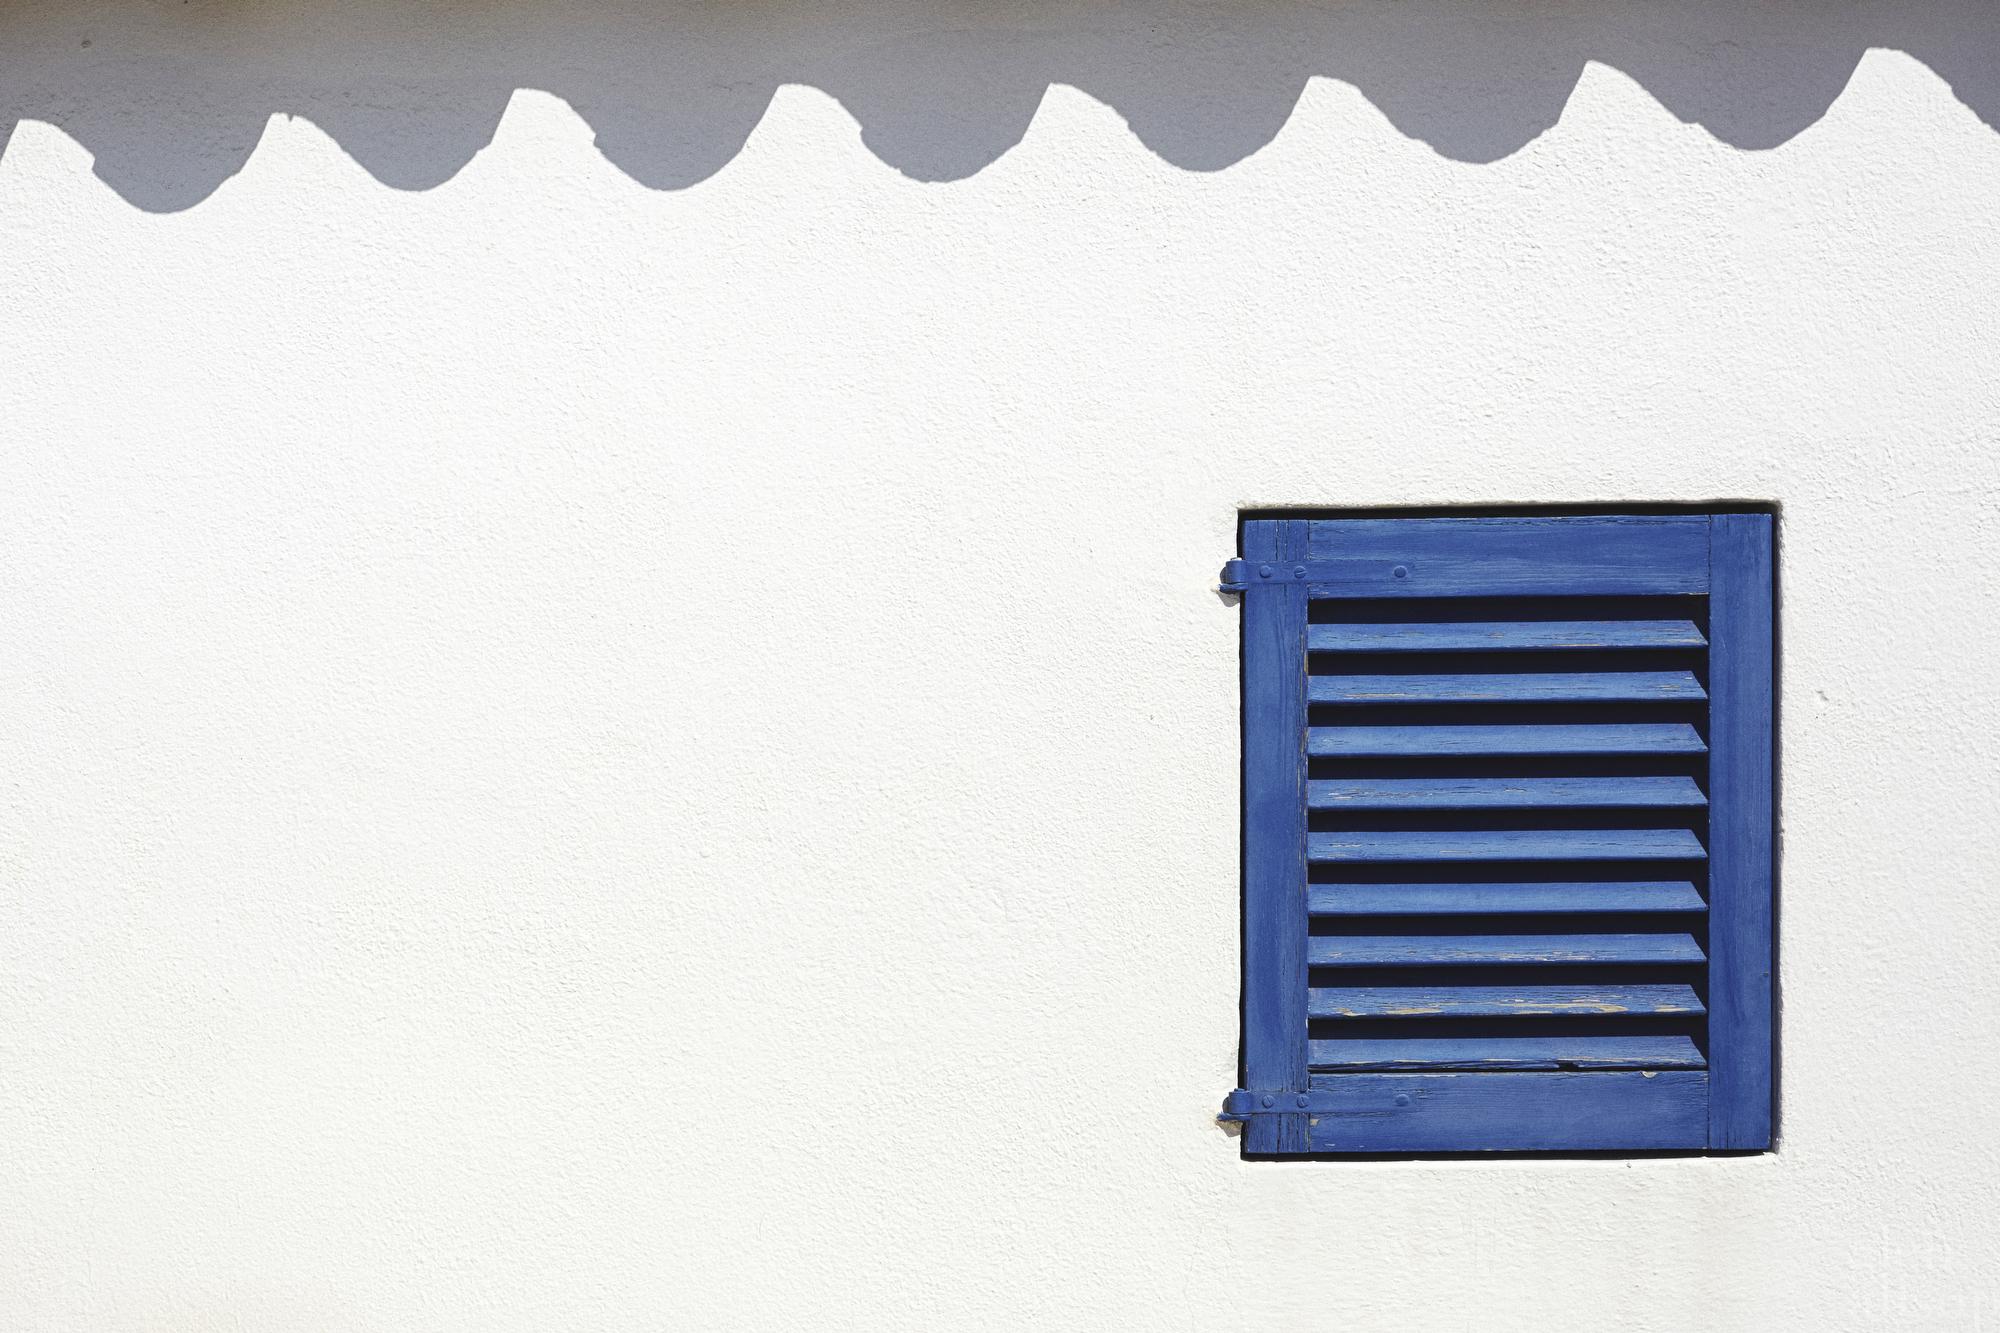 formentera-blue window-window shutters-shadows